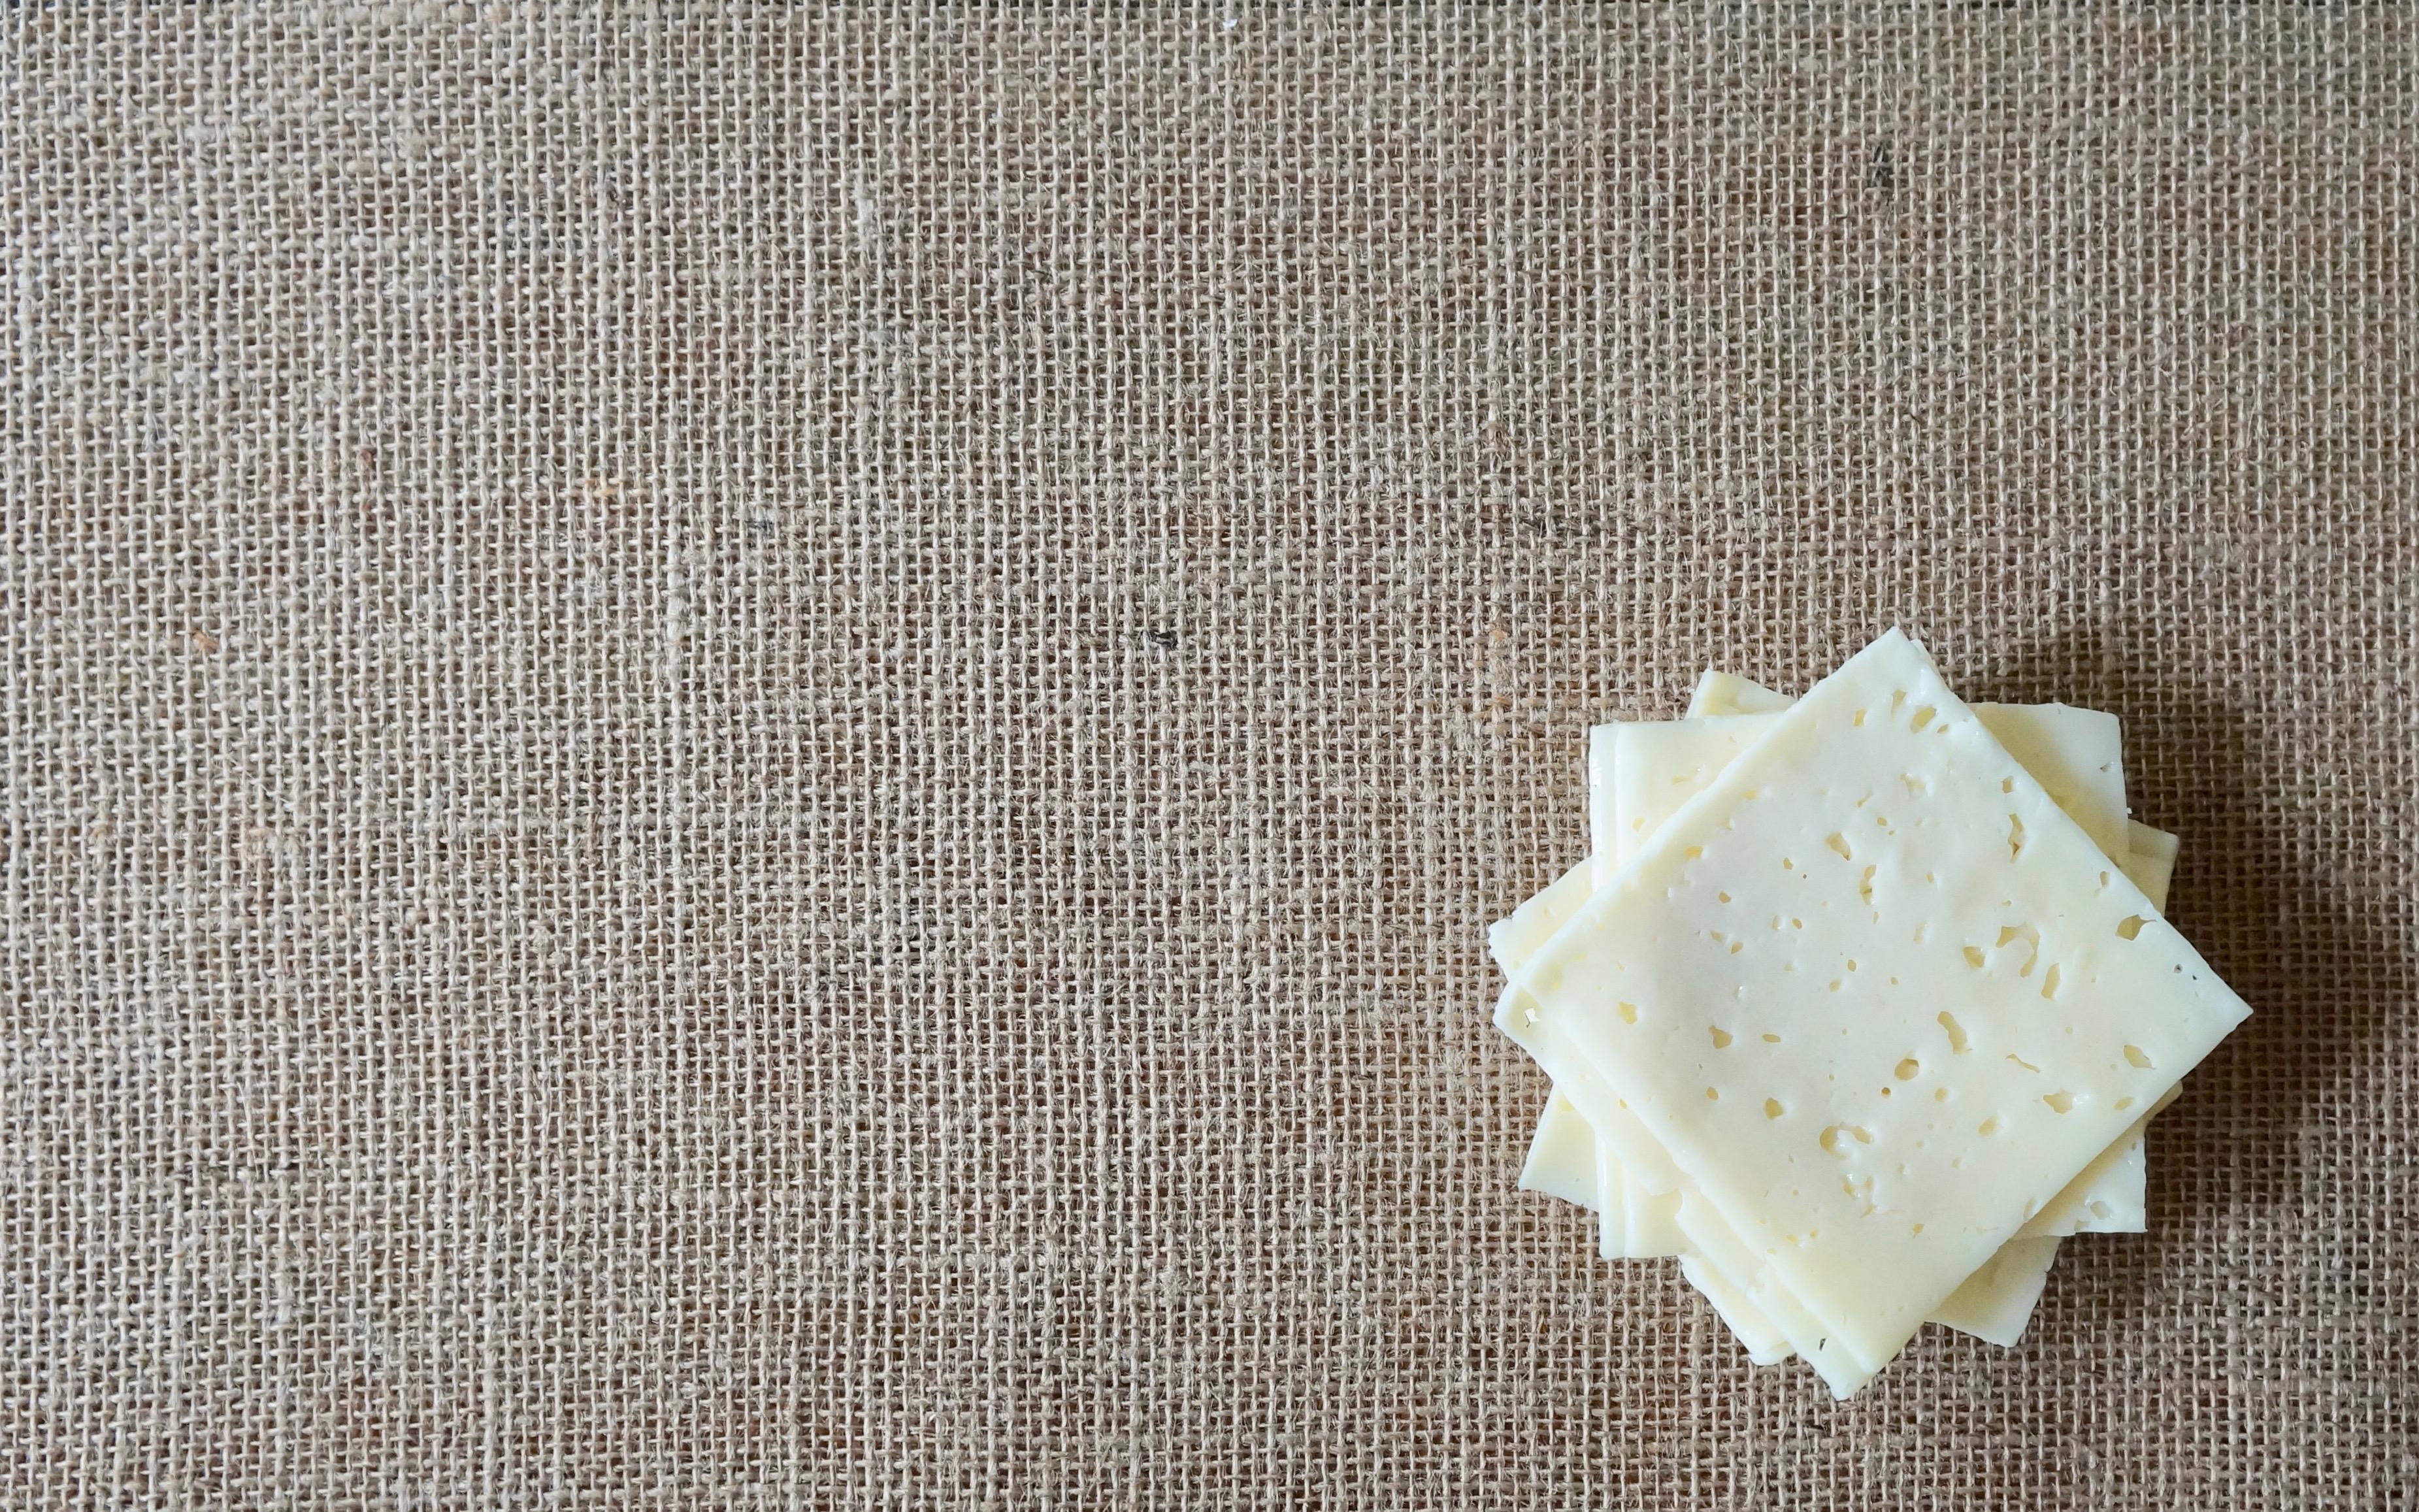 The Essential Guide To Swiss Cheese Rebecca Gordon Publisher Buttermilk Lipstick Culinary Entertaining Techniques Alpine Cheese RebeccaGordon Birmingham Alabama